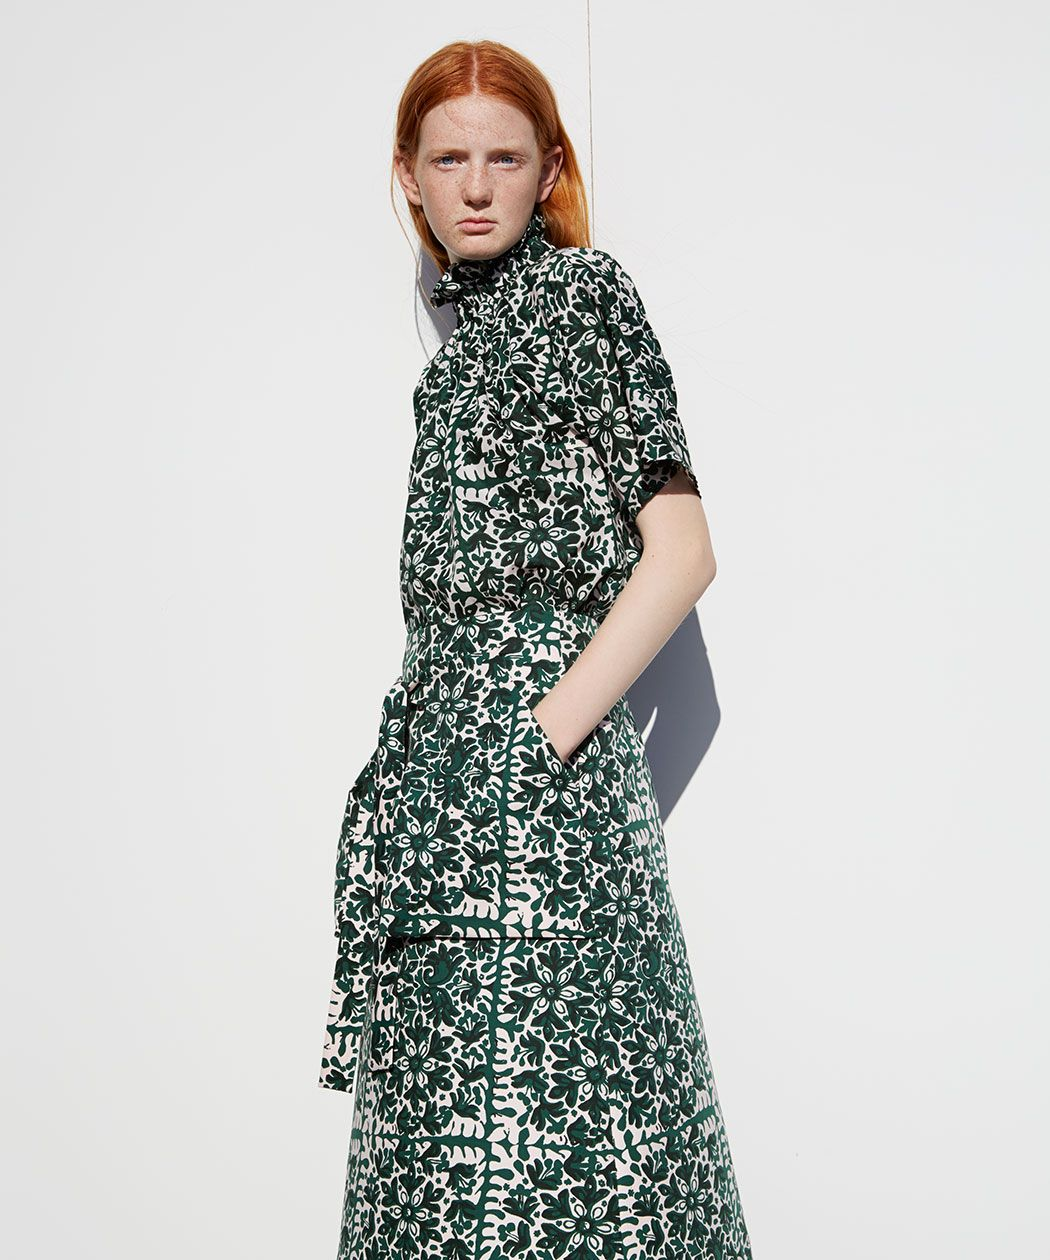 Marimekko fabric collection